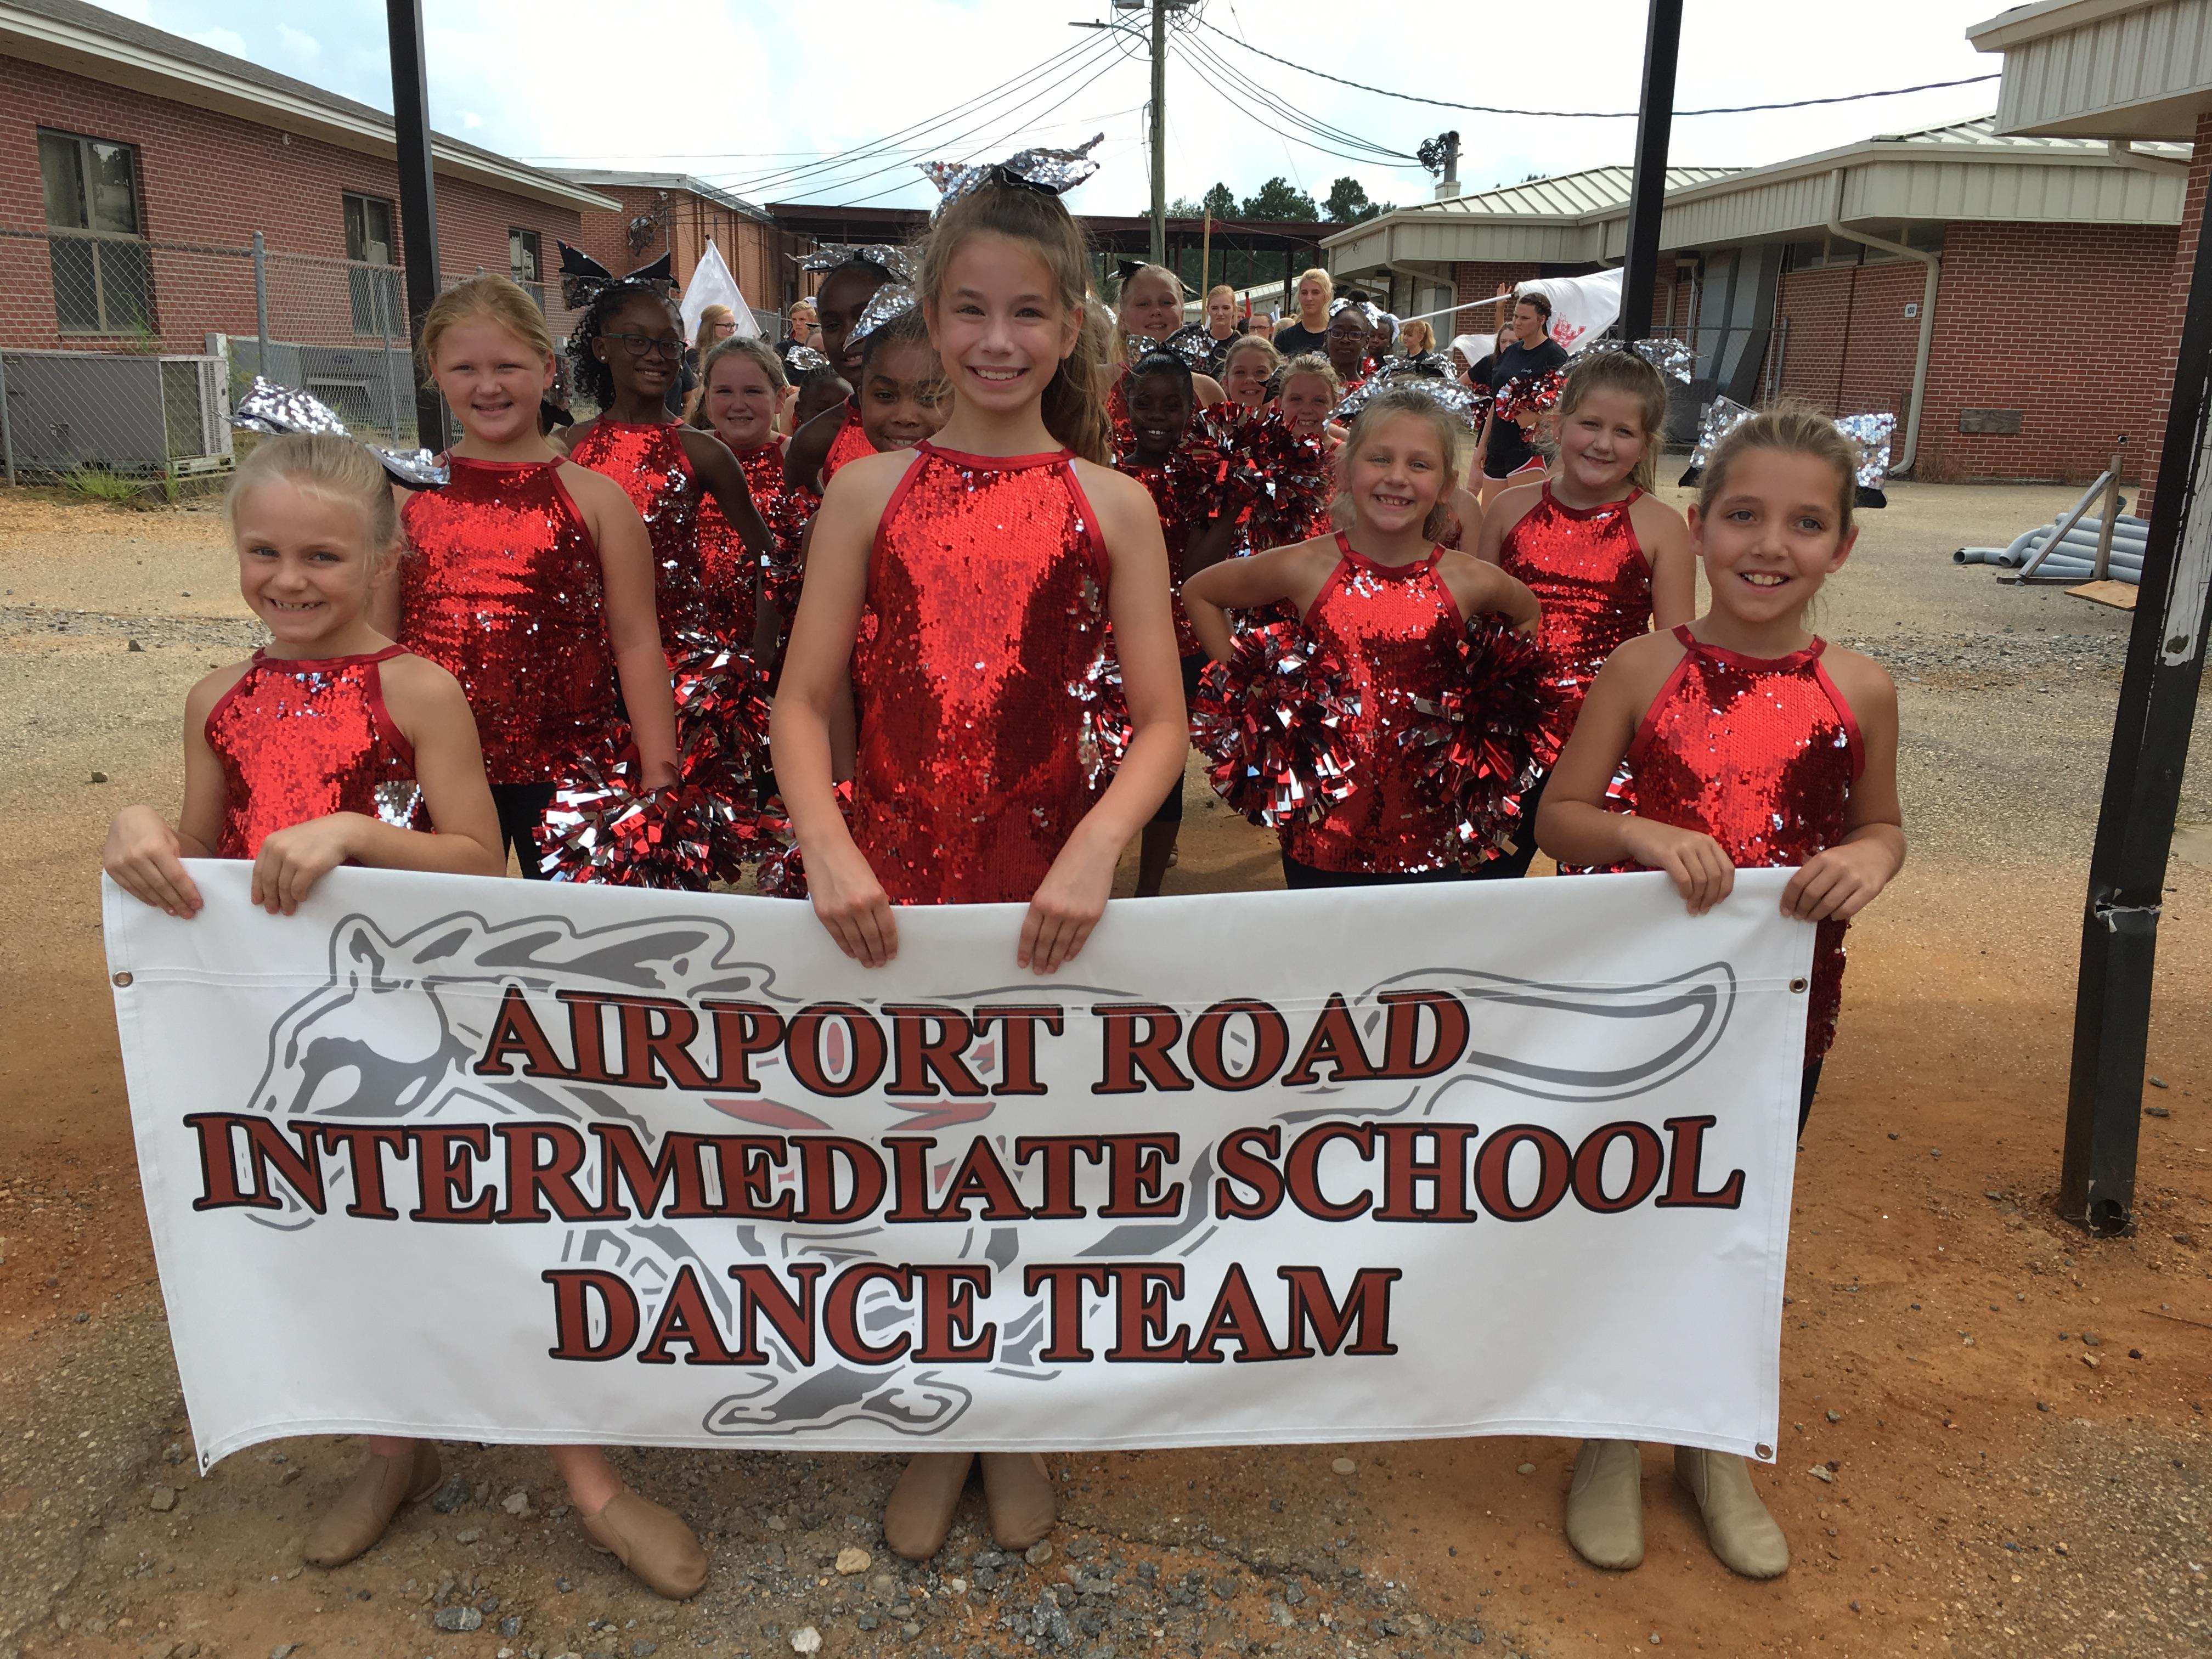 Dance team holding sign